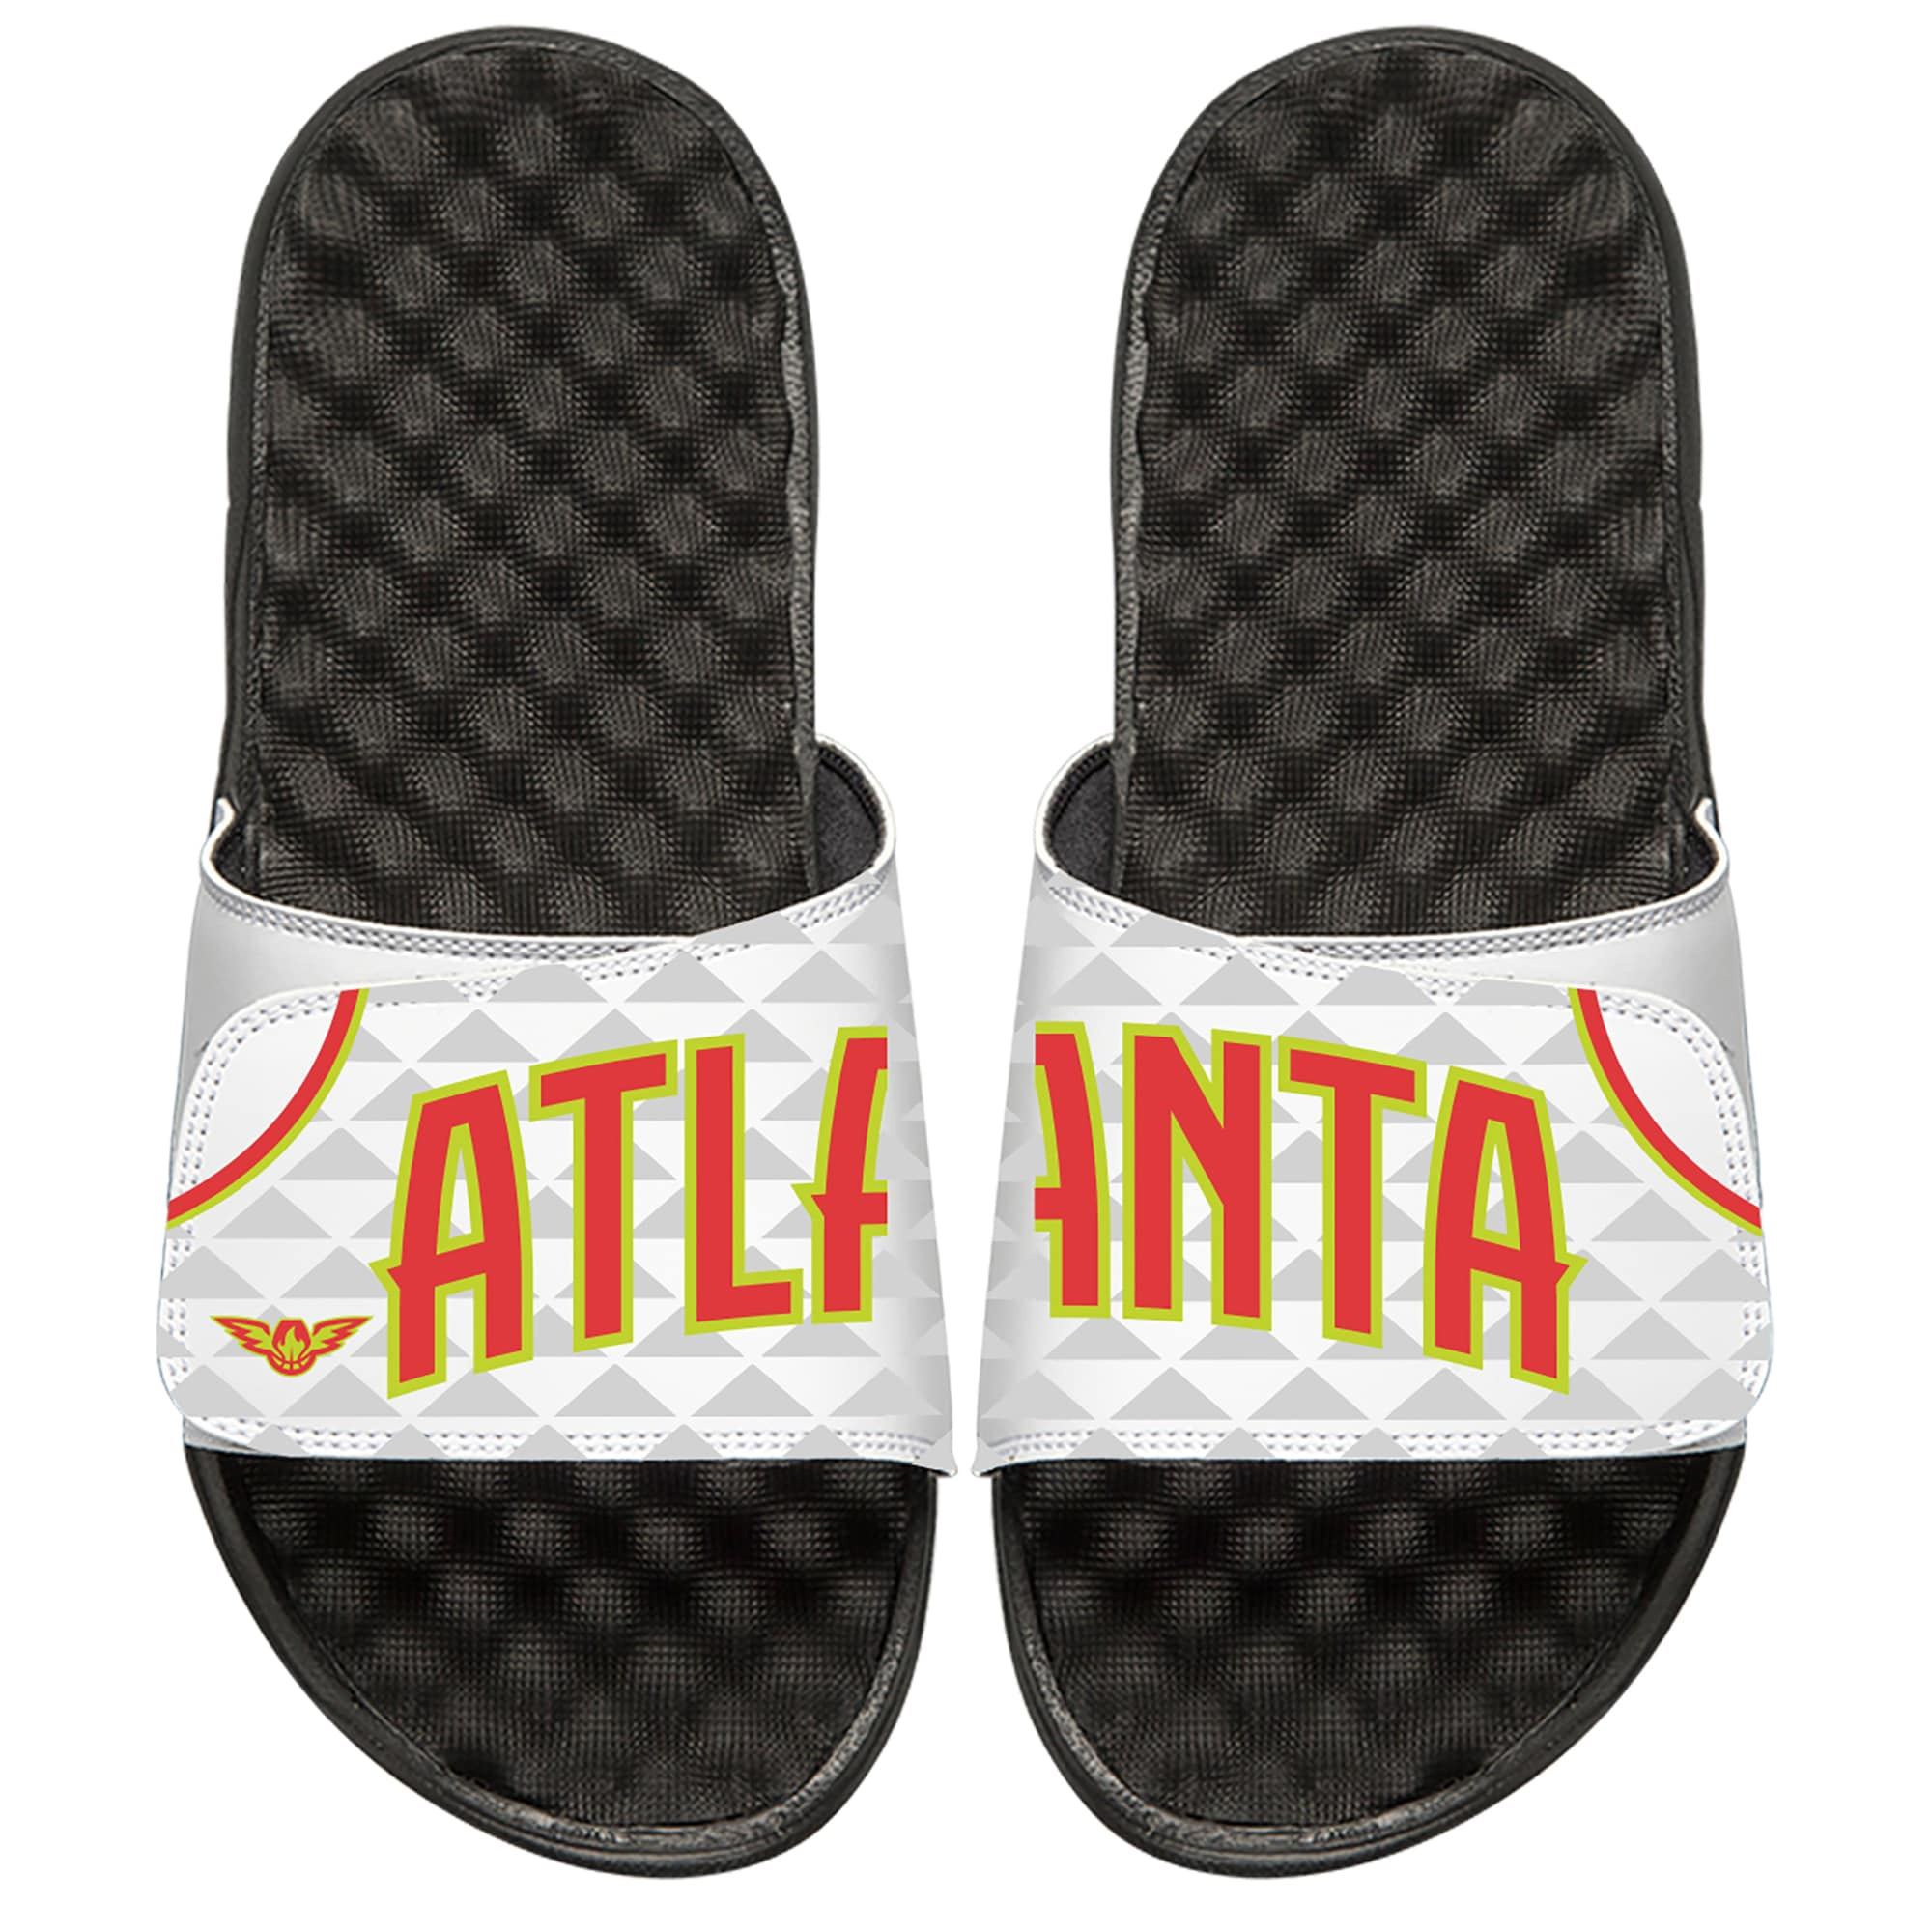 Atlanta Hawks ISlide Home Jersey Split Slide Sandals - White